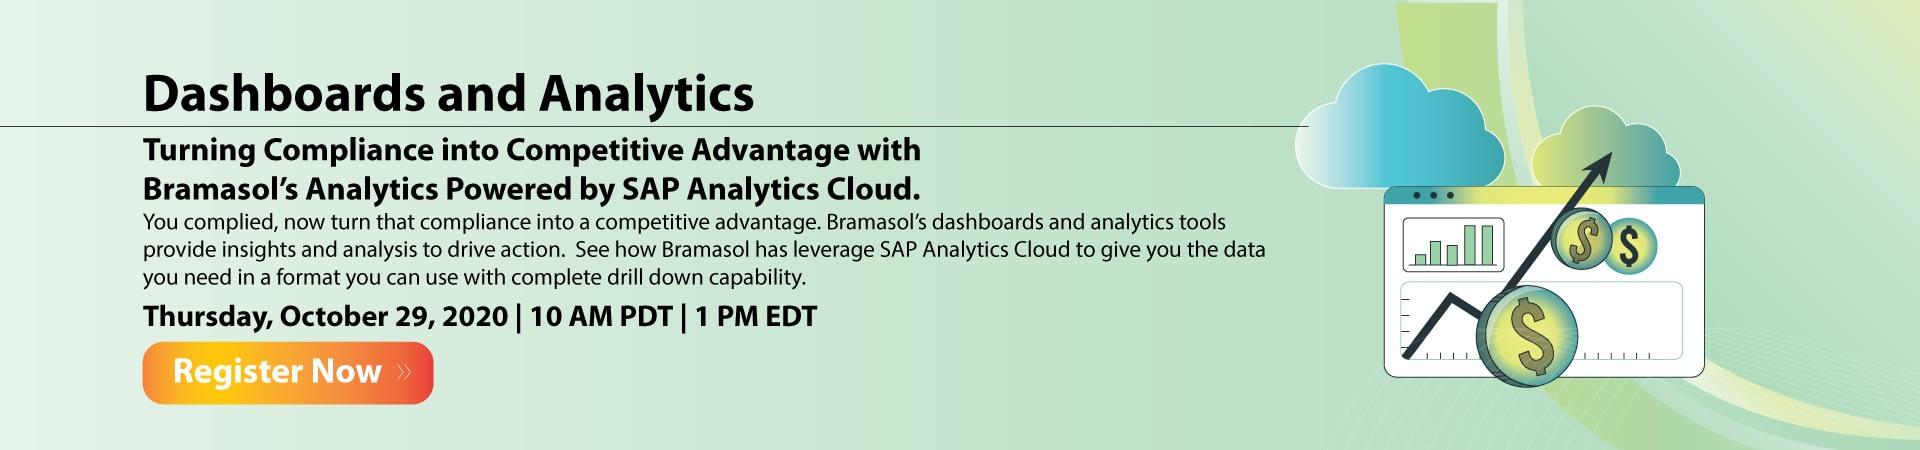 Dashboards and Analytics Banner